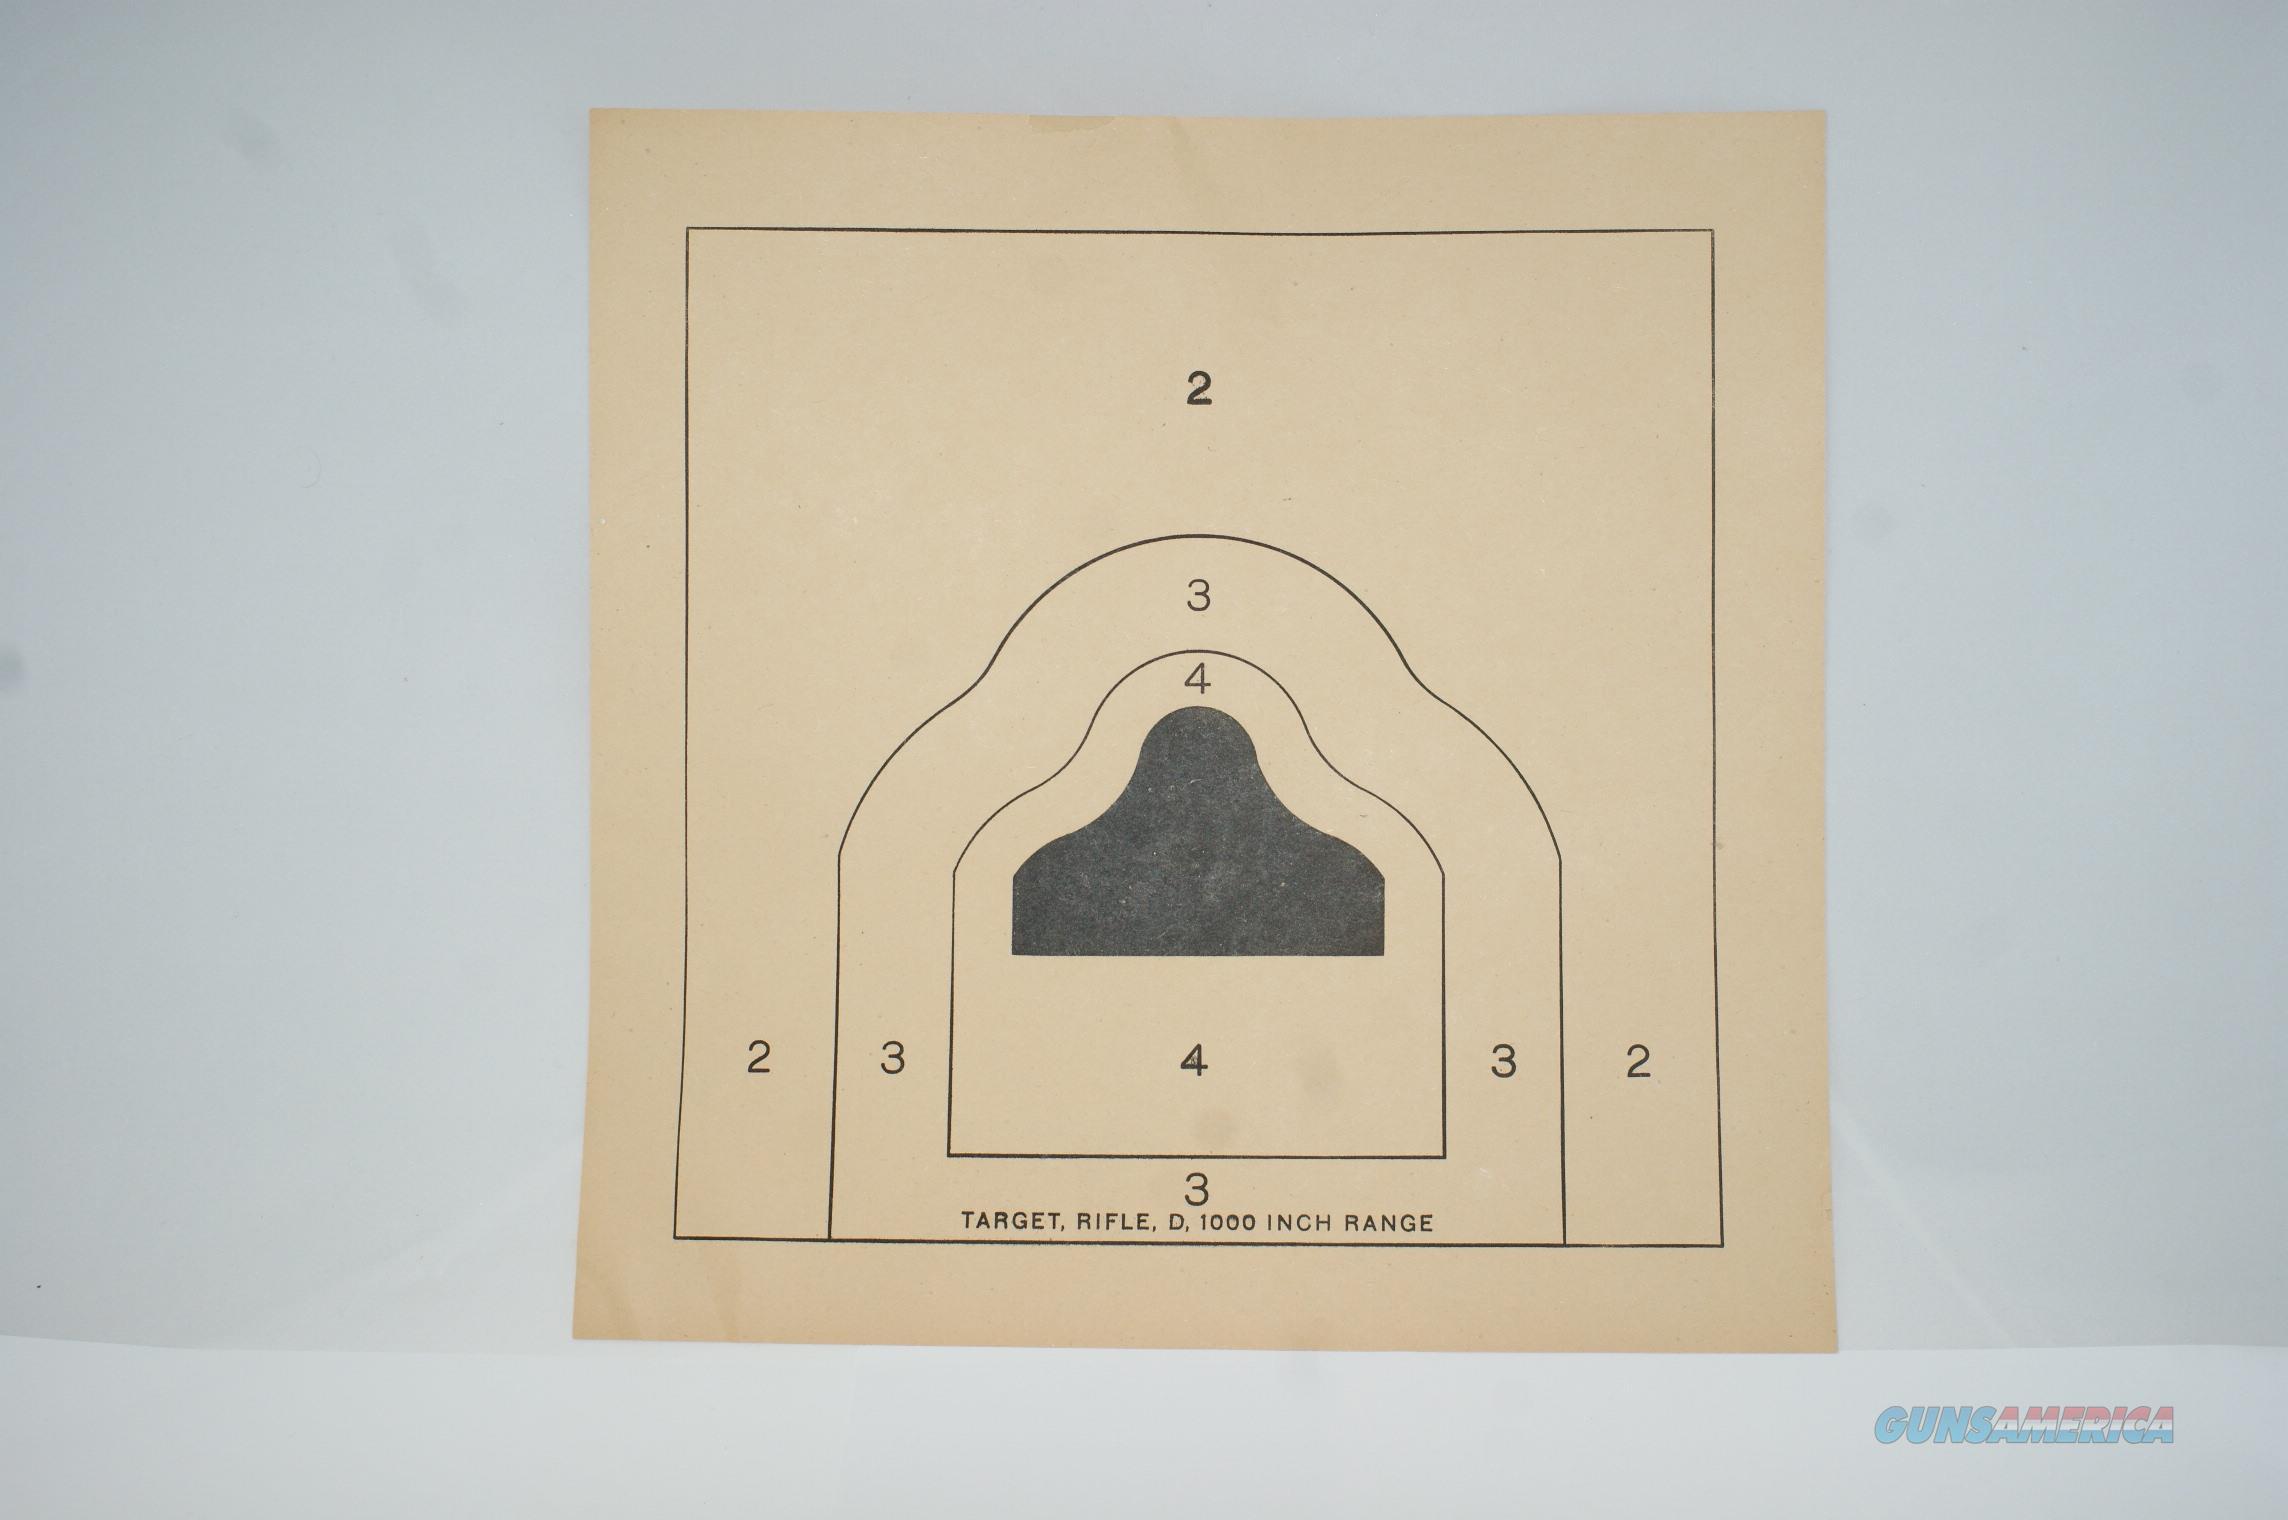 25 Meter (1000 inch) Target 50 PCS.  Non-Guns > Targets > Paper Targets > Standard